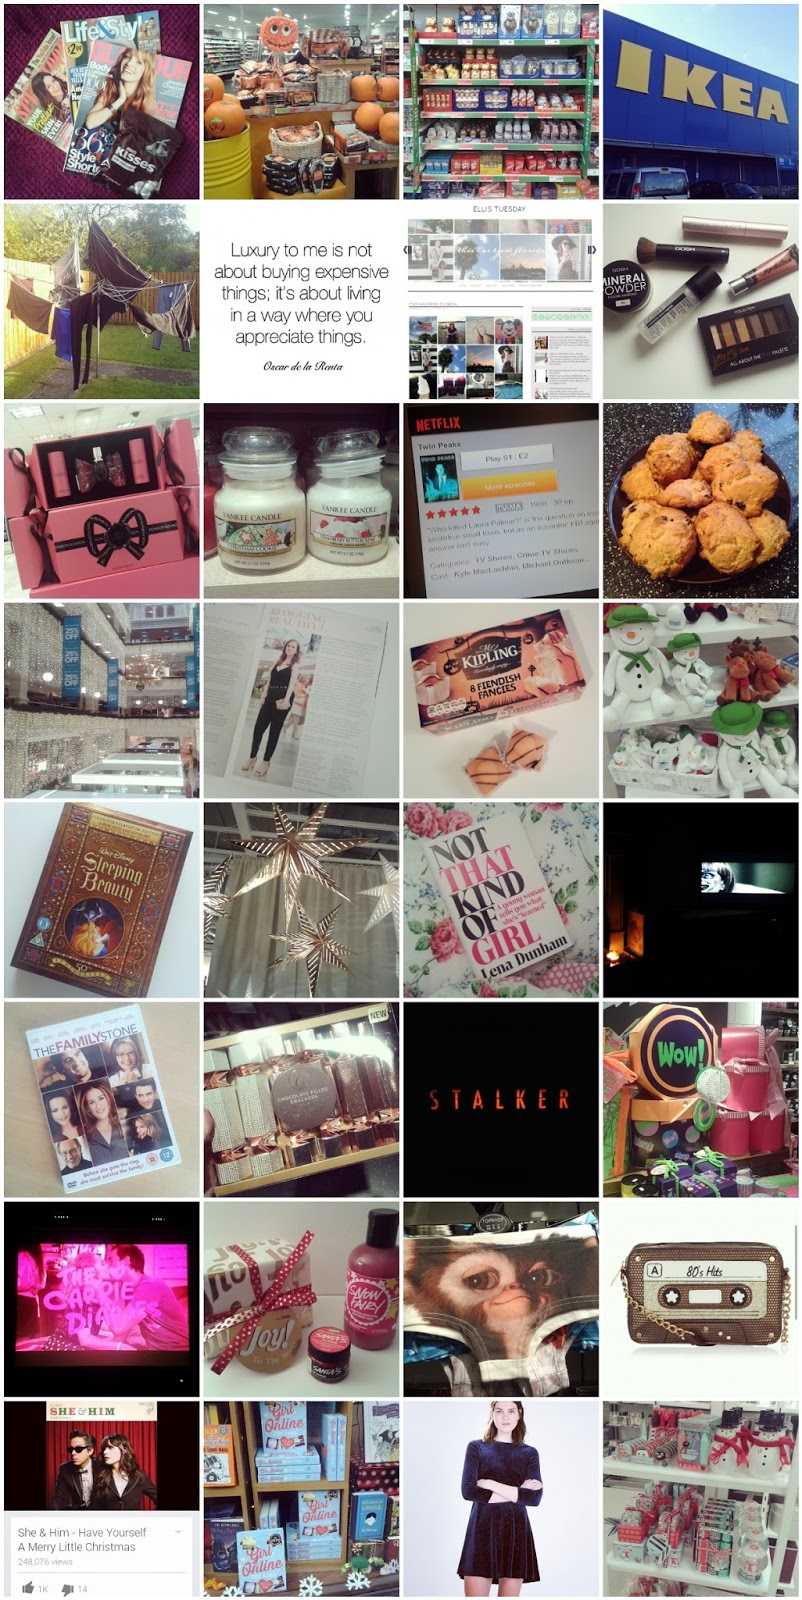 November October 2014 Instagram